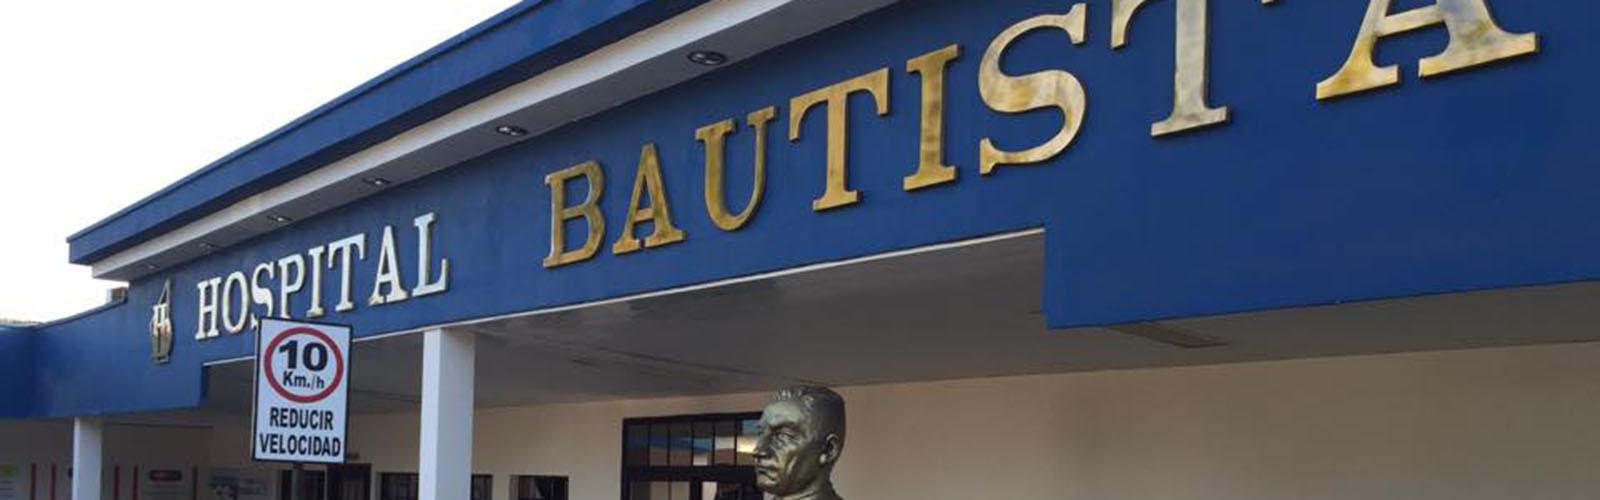 blue hospital building with brass lettering Hospital Batista